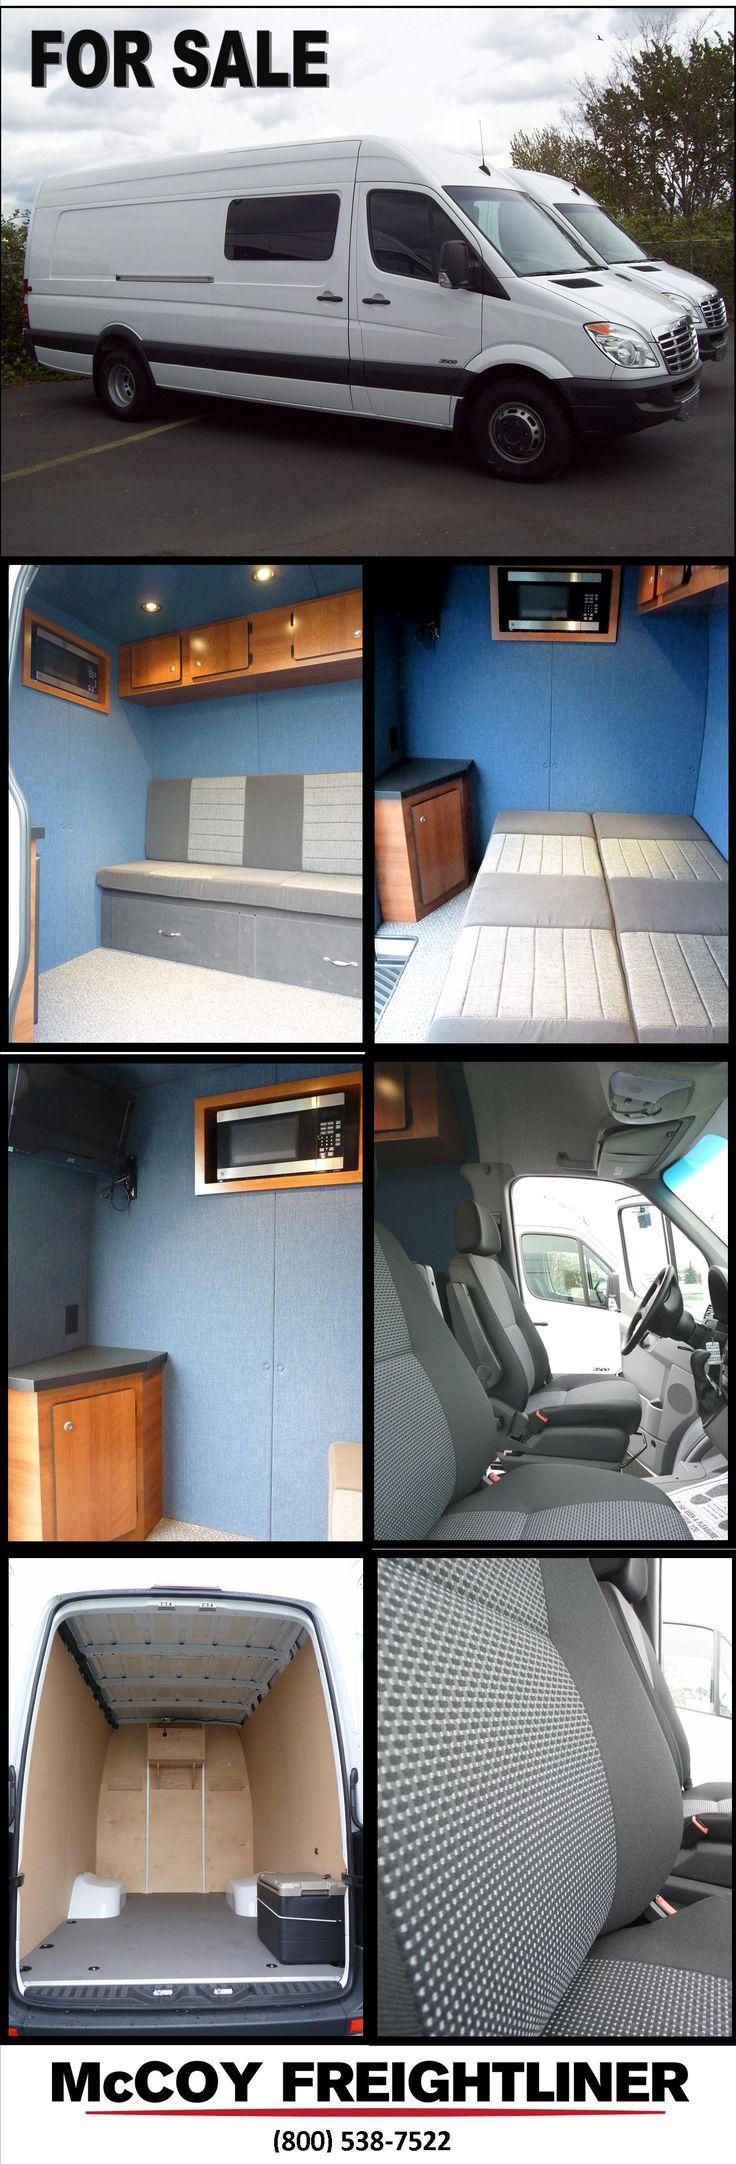 Sprinter Van for sale! Toy Hauler, Weekend Traveler, Full